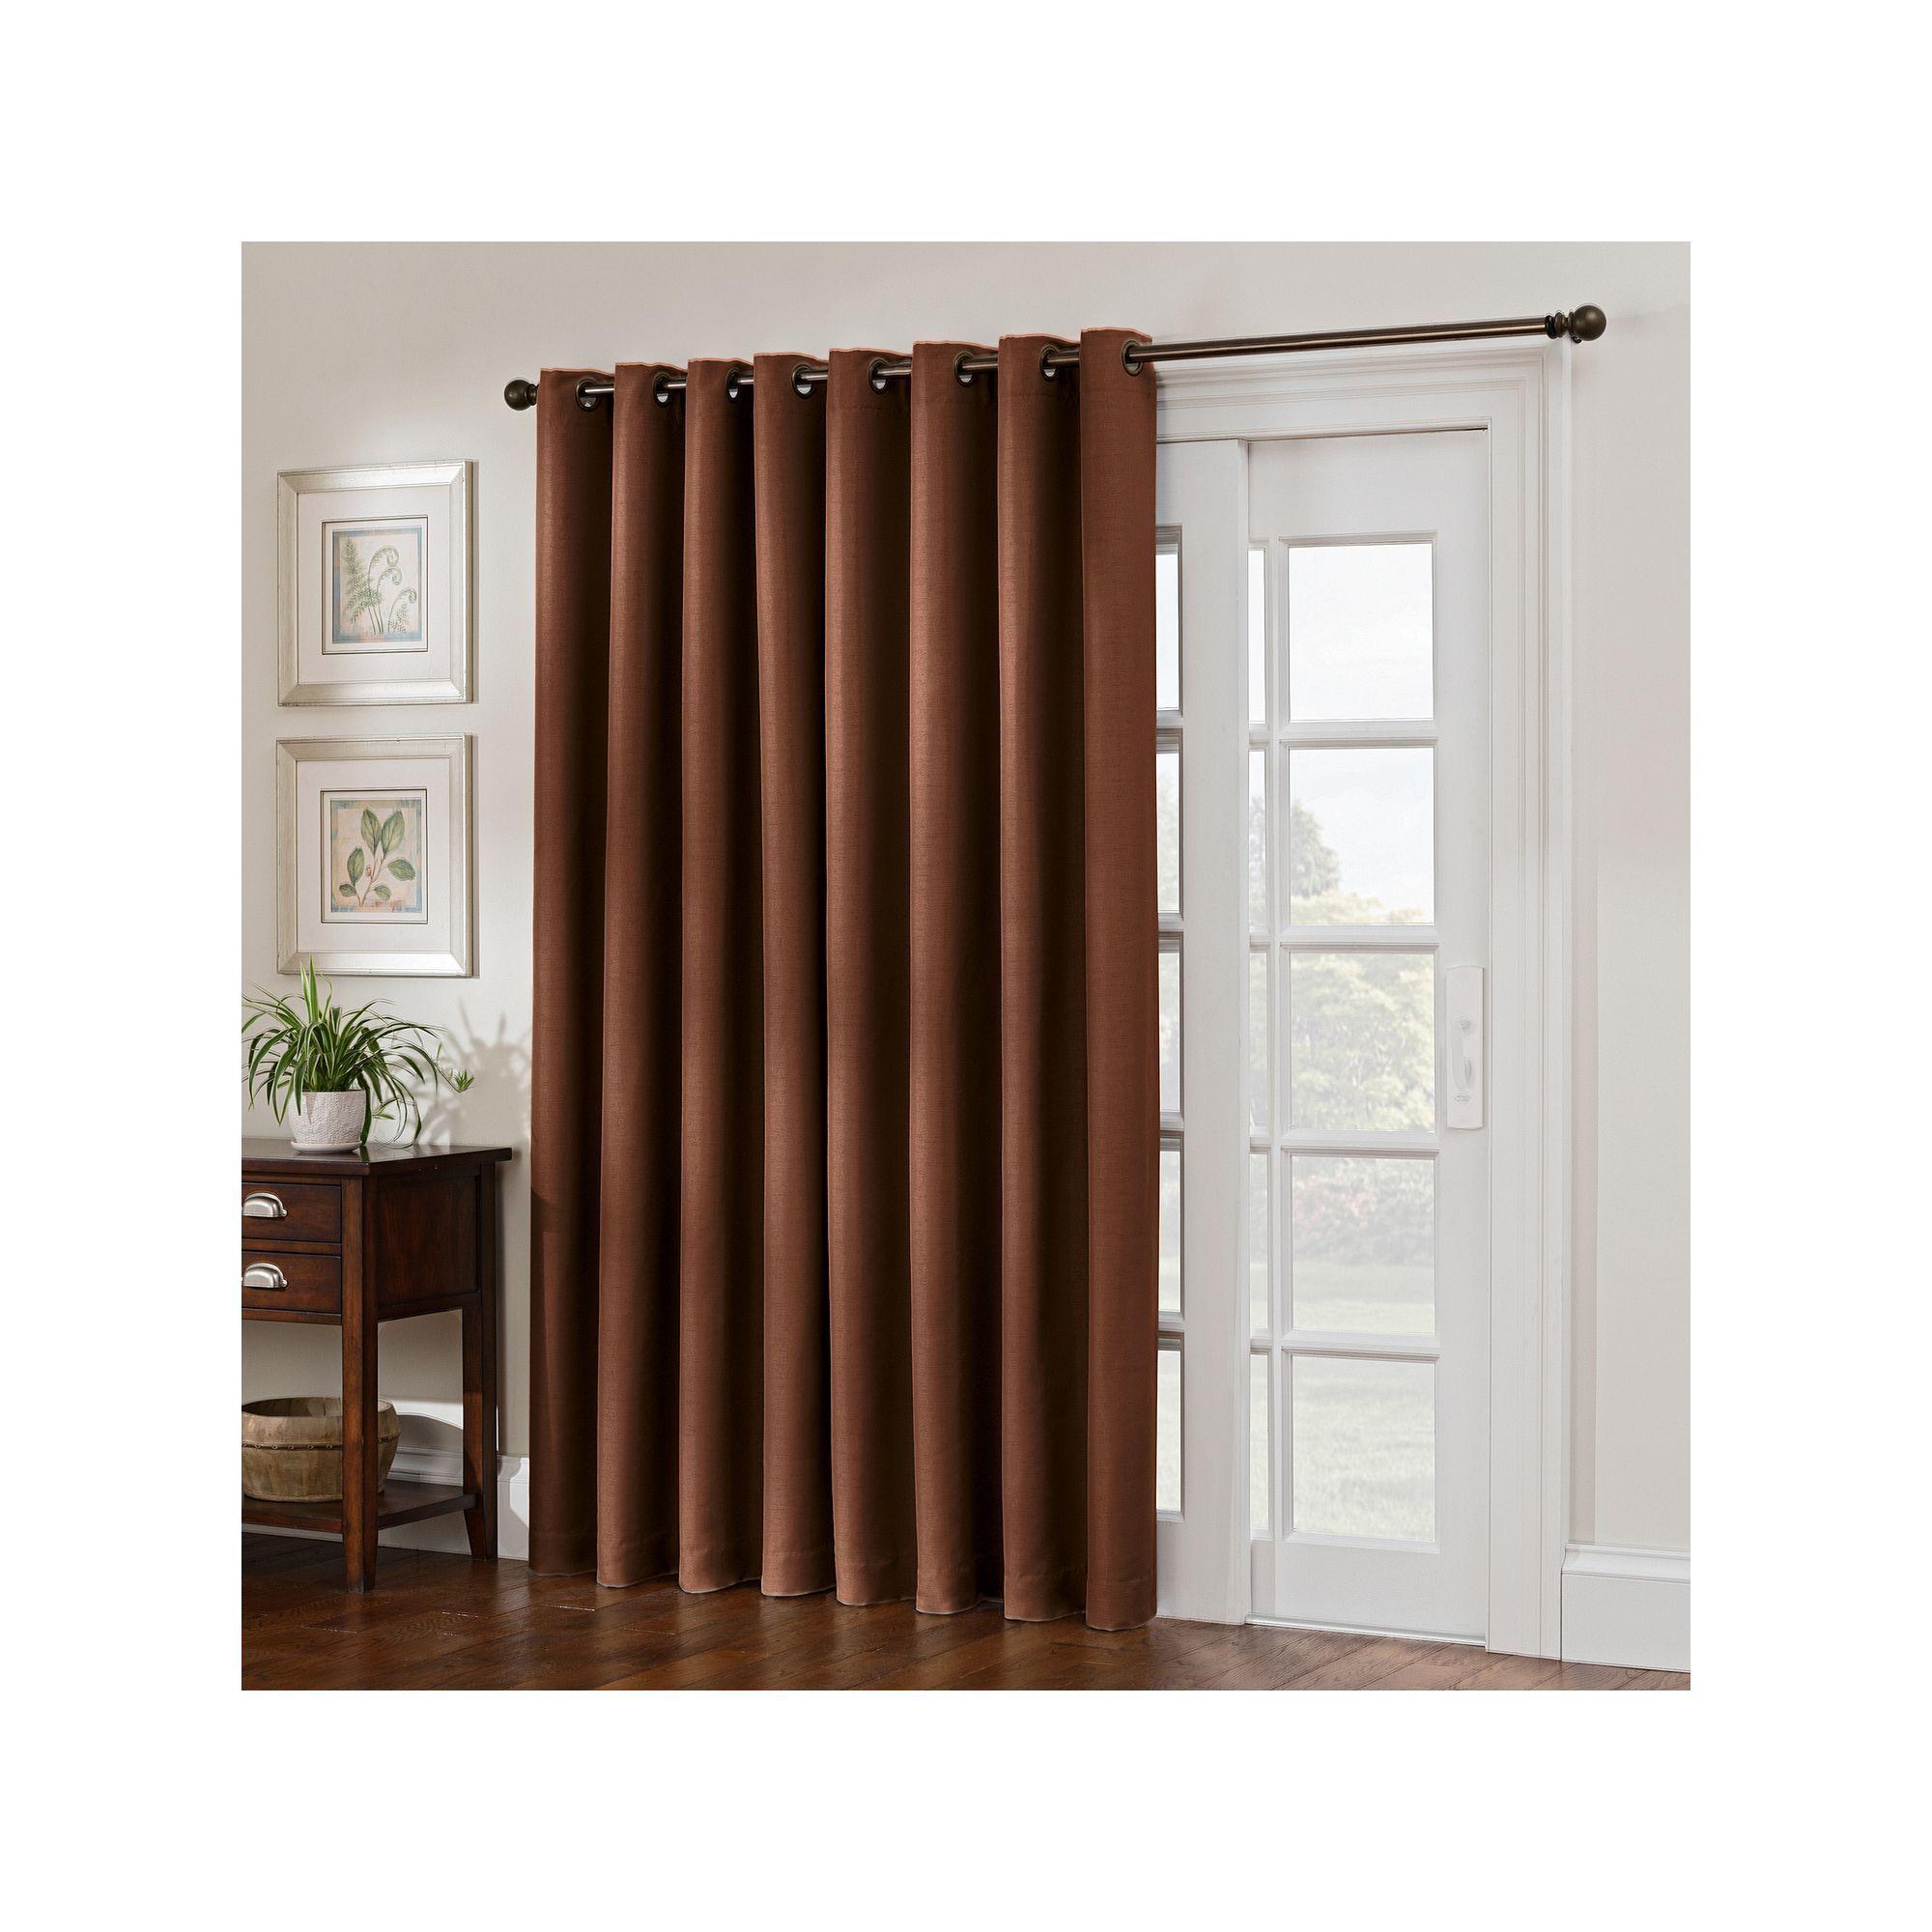 Style domain antique satin patio door curtain white door curtains